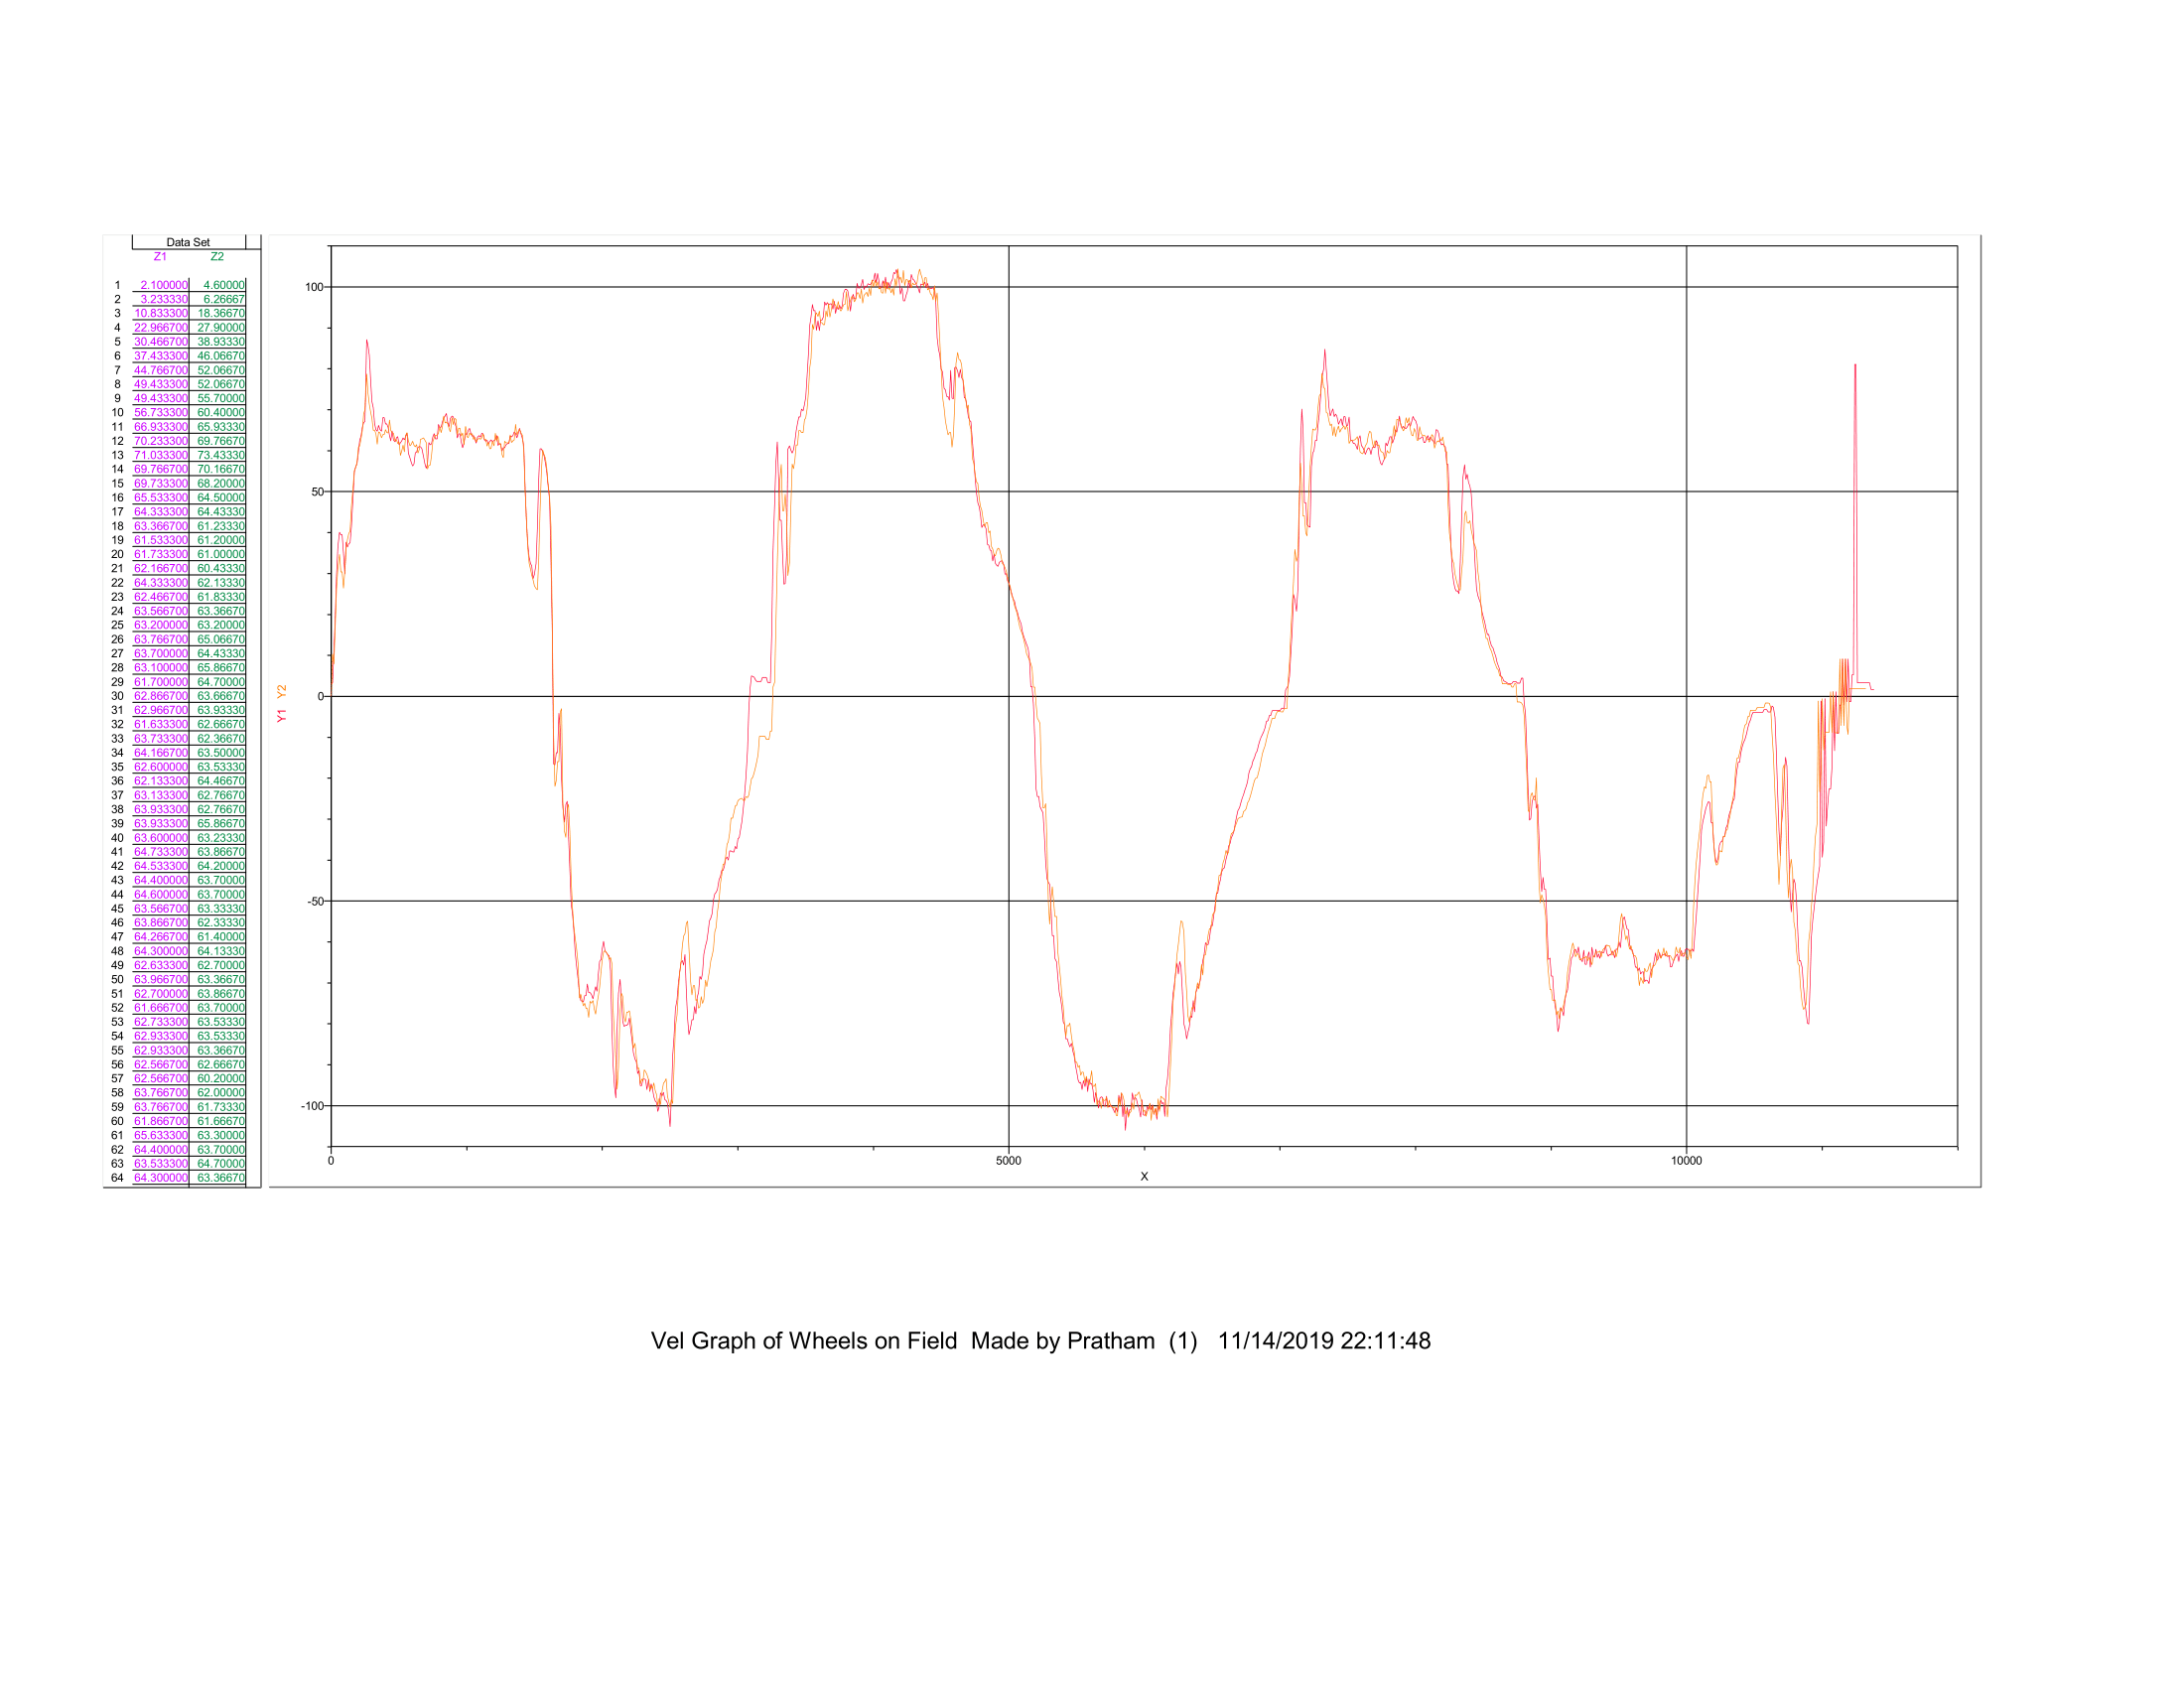 vel_graph_of_wheels_on_field-1